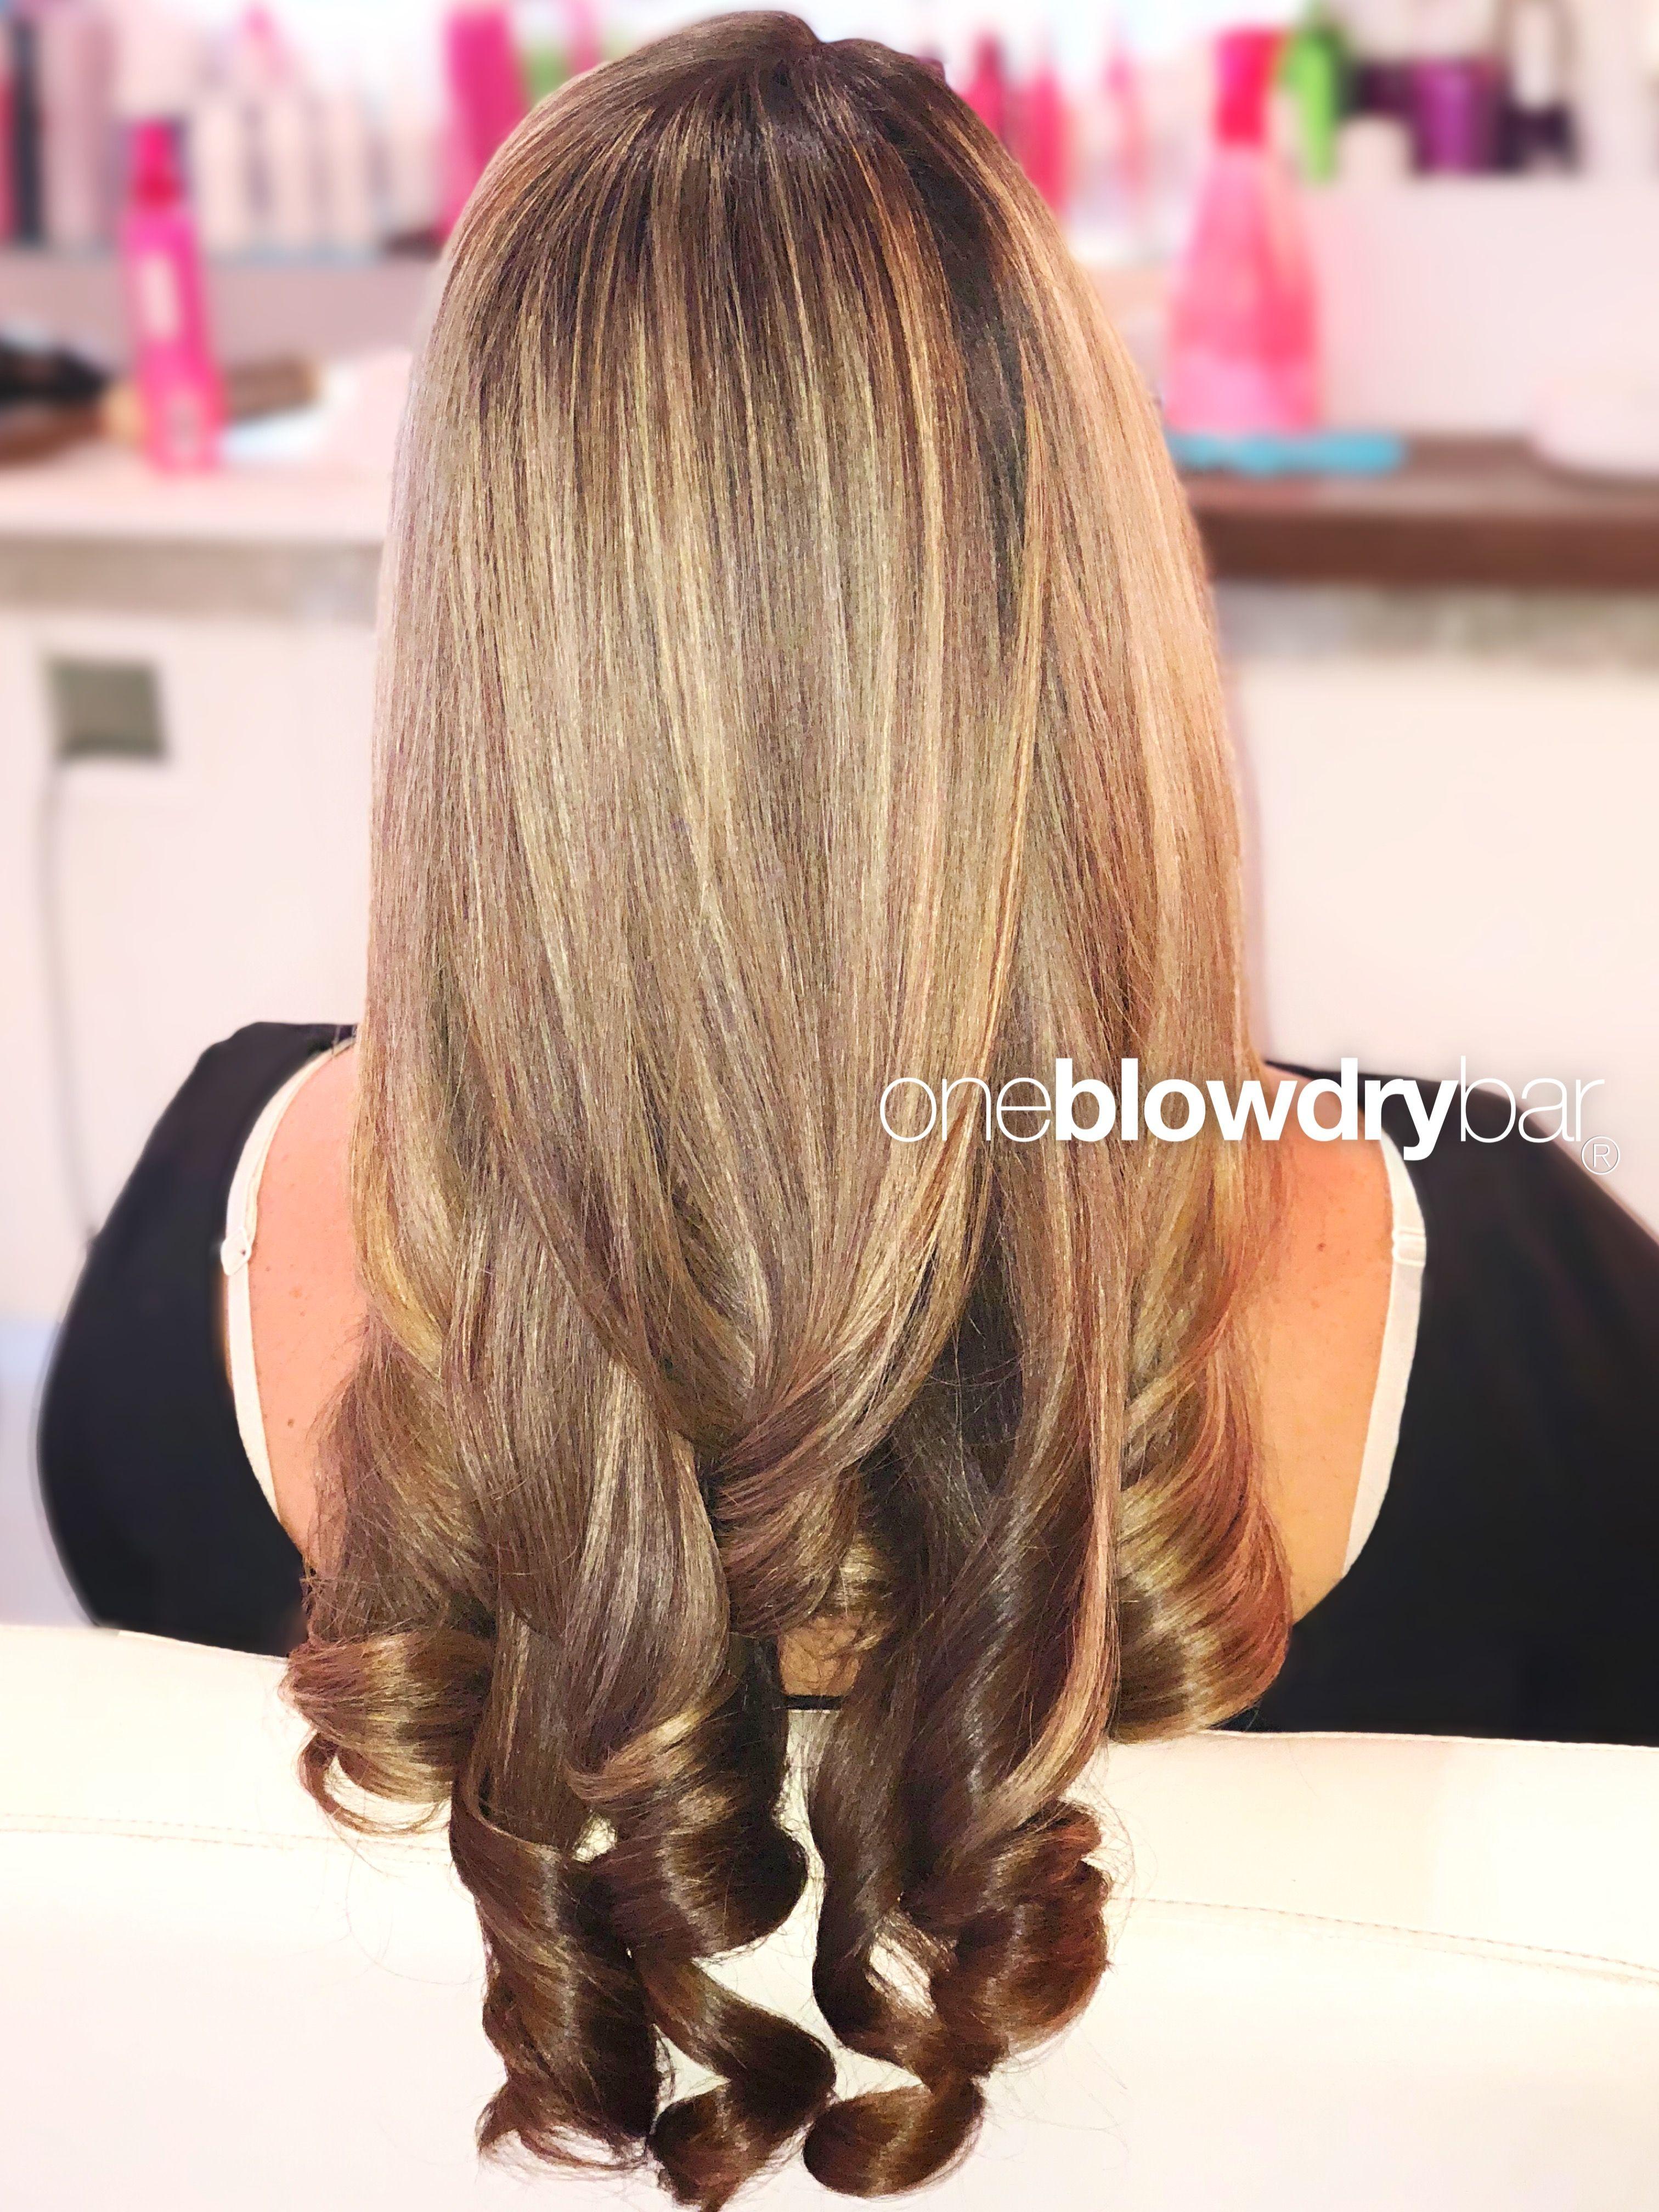 East Coast Blow Dry Bar Blowout Hairstyling Destinations For Blowouts Hair Styles Blowout Hair Dry Bar Hair